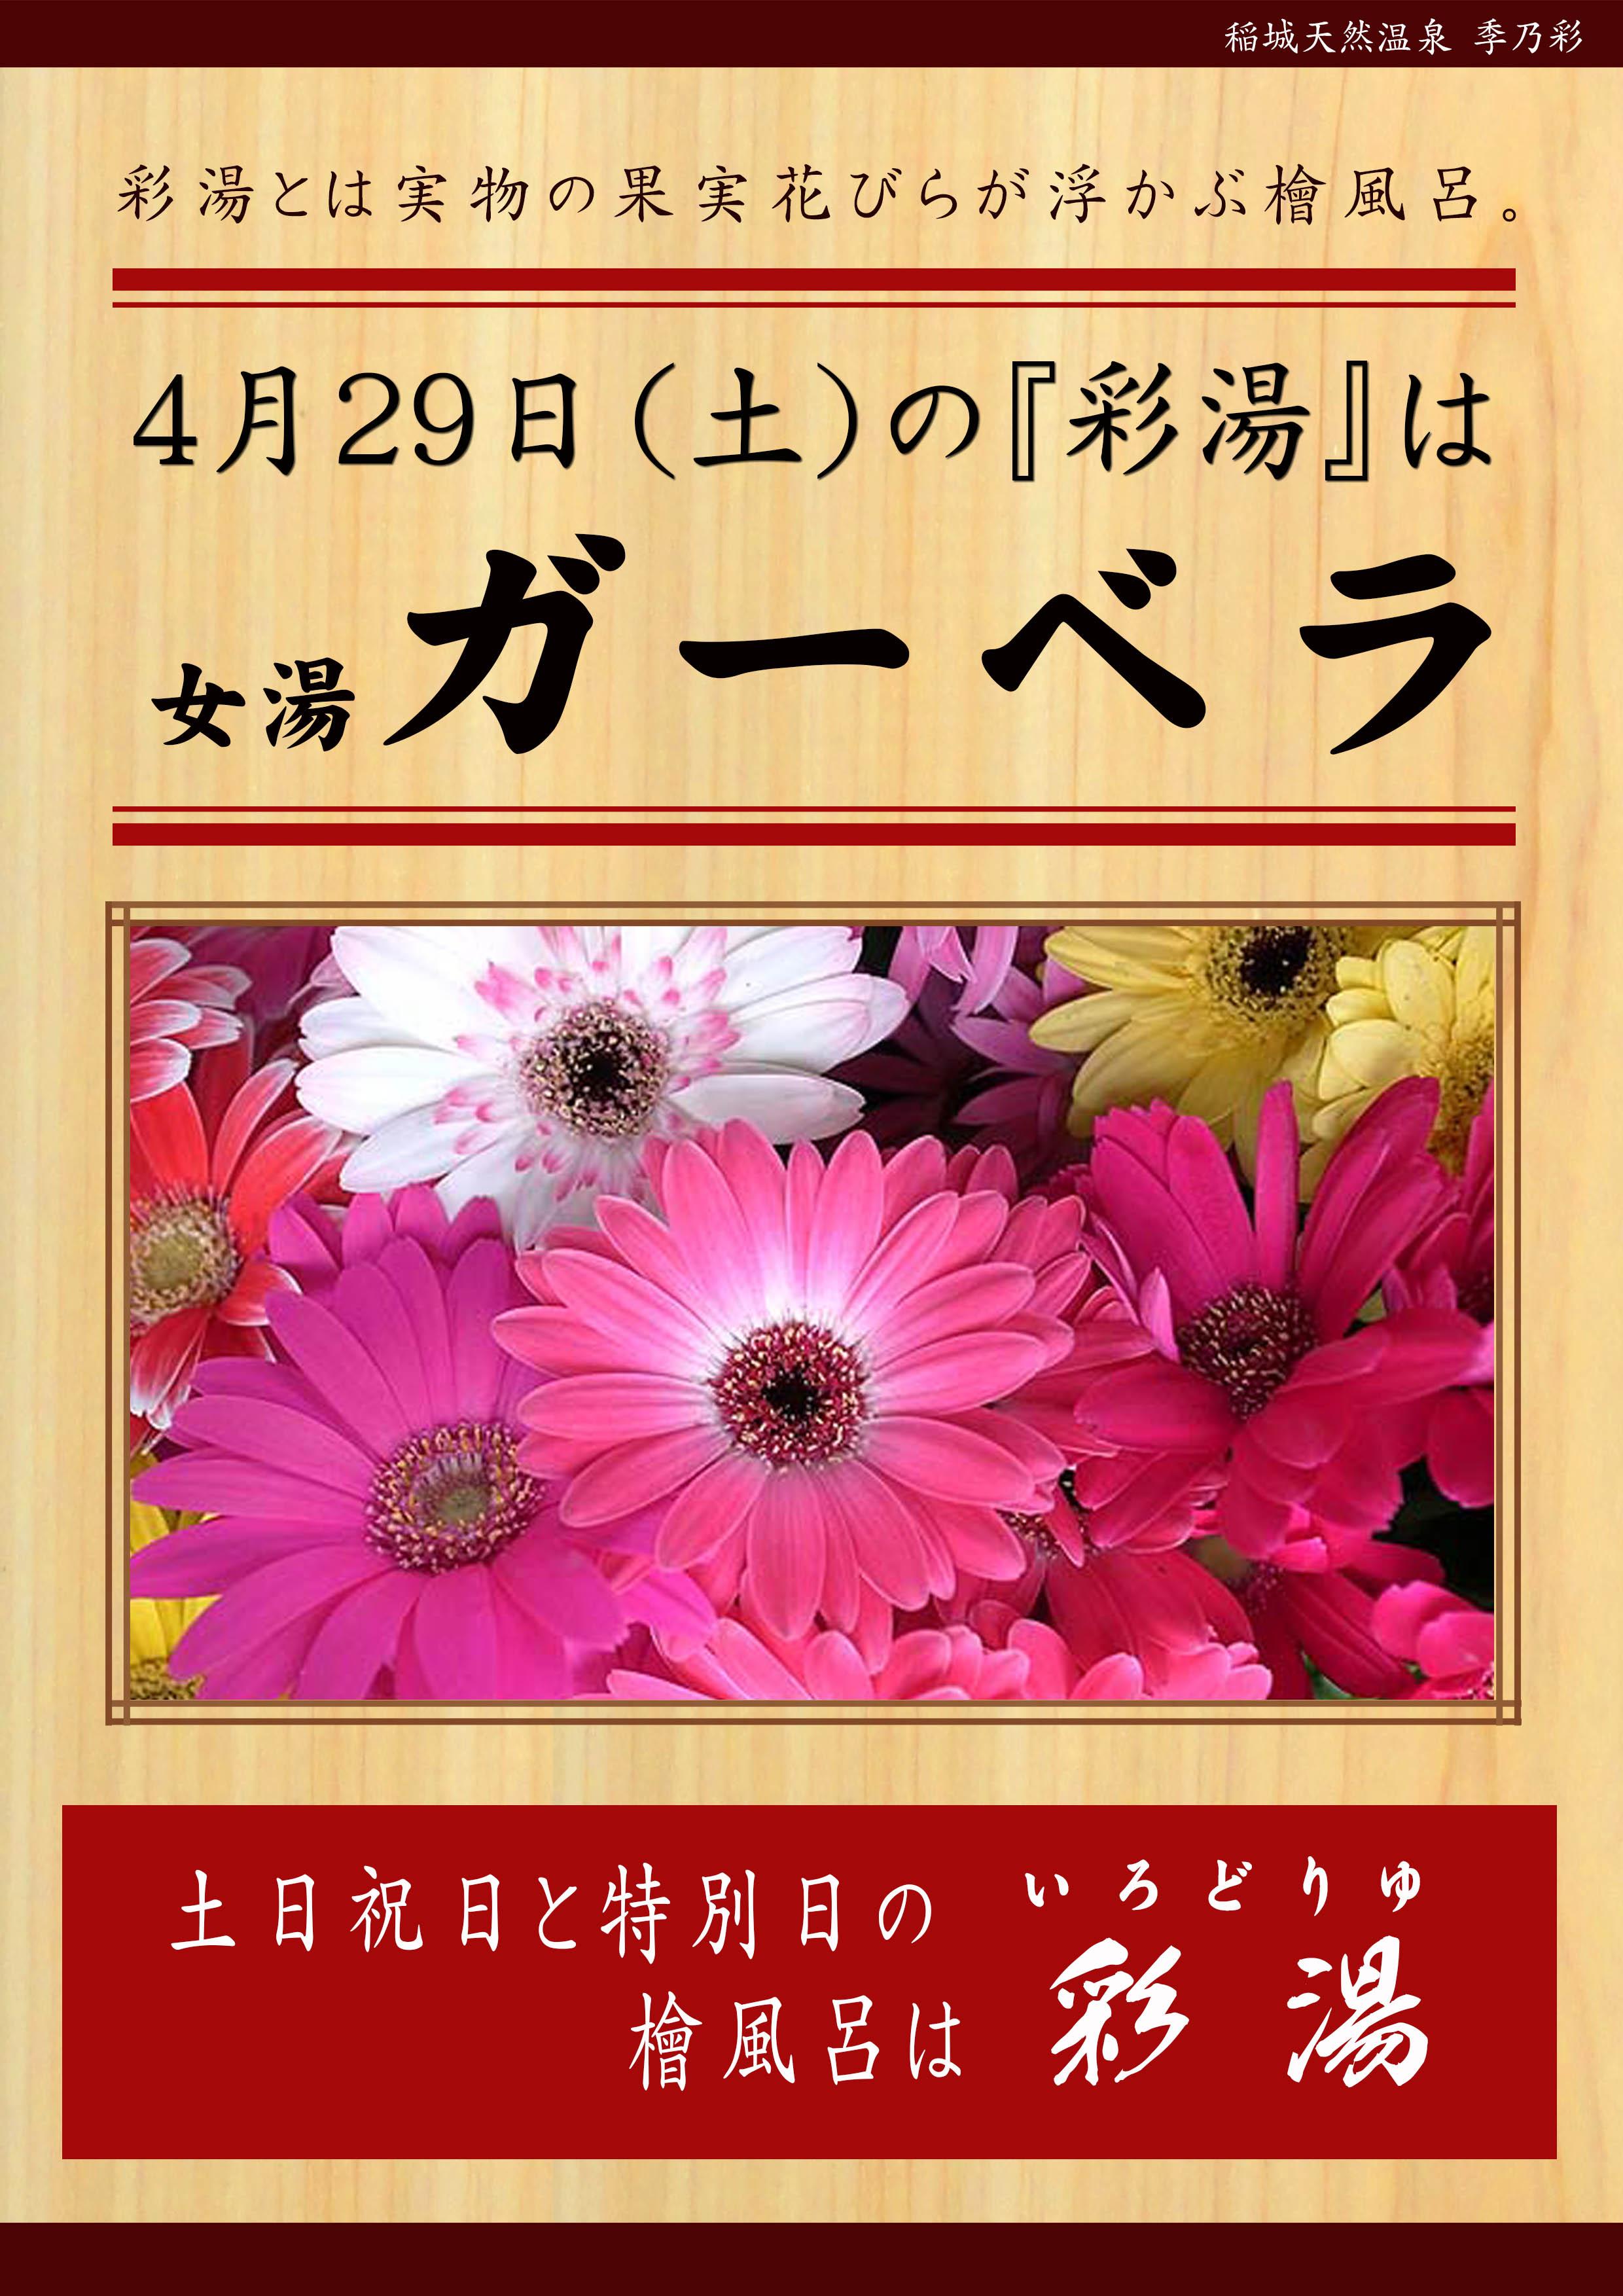 20170429POP イベント 彩湯 女湯 ガーベラ